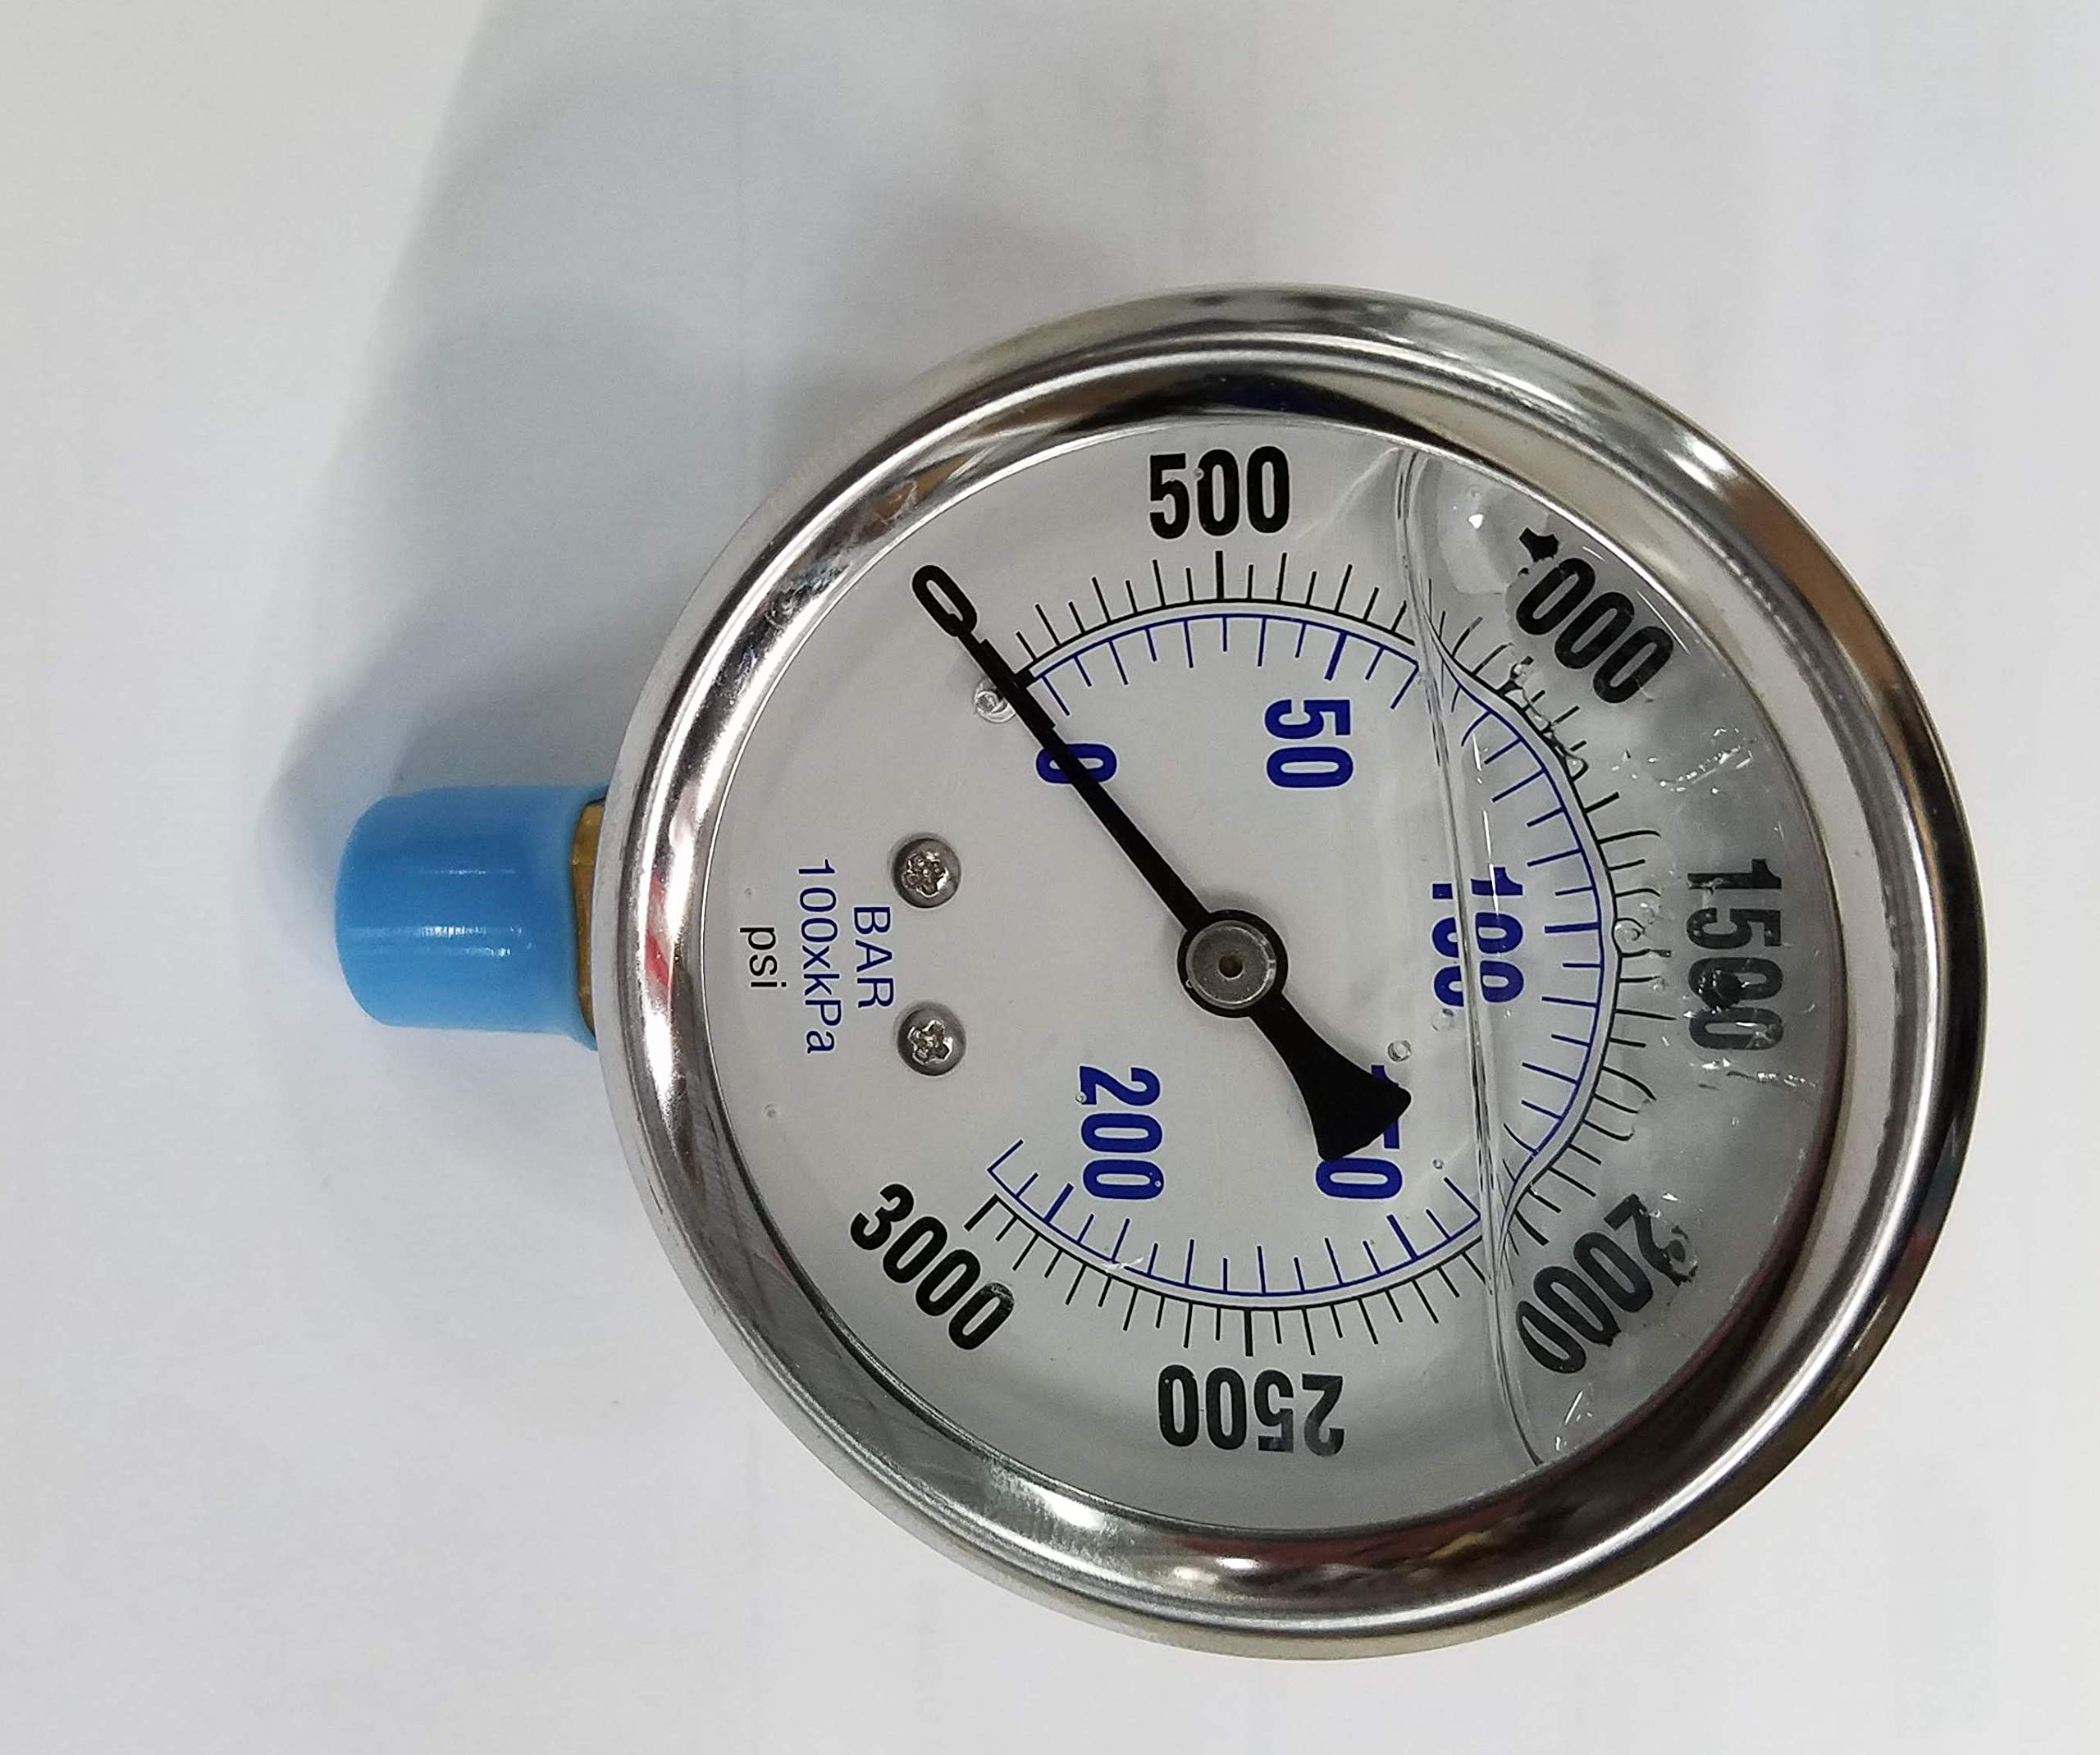 AR Annovi Reverberi AR0-3000 Pressure Washer Unloader, 3000 Max PSI Stainless Steel